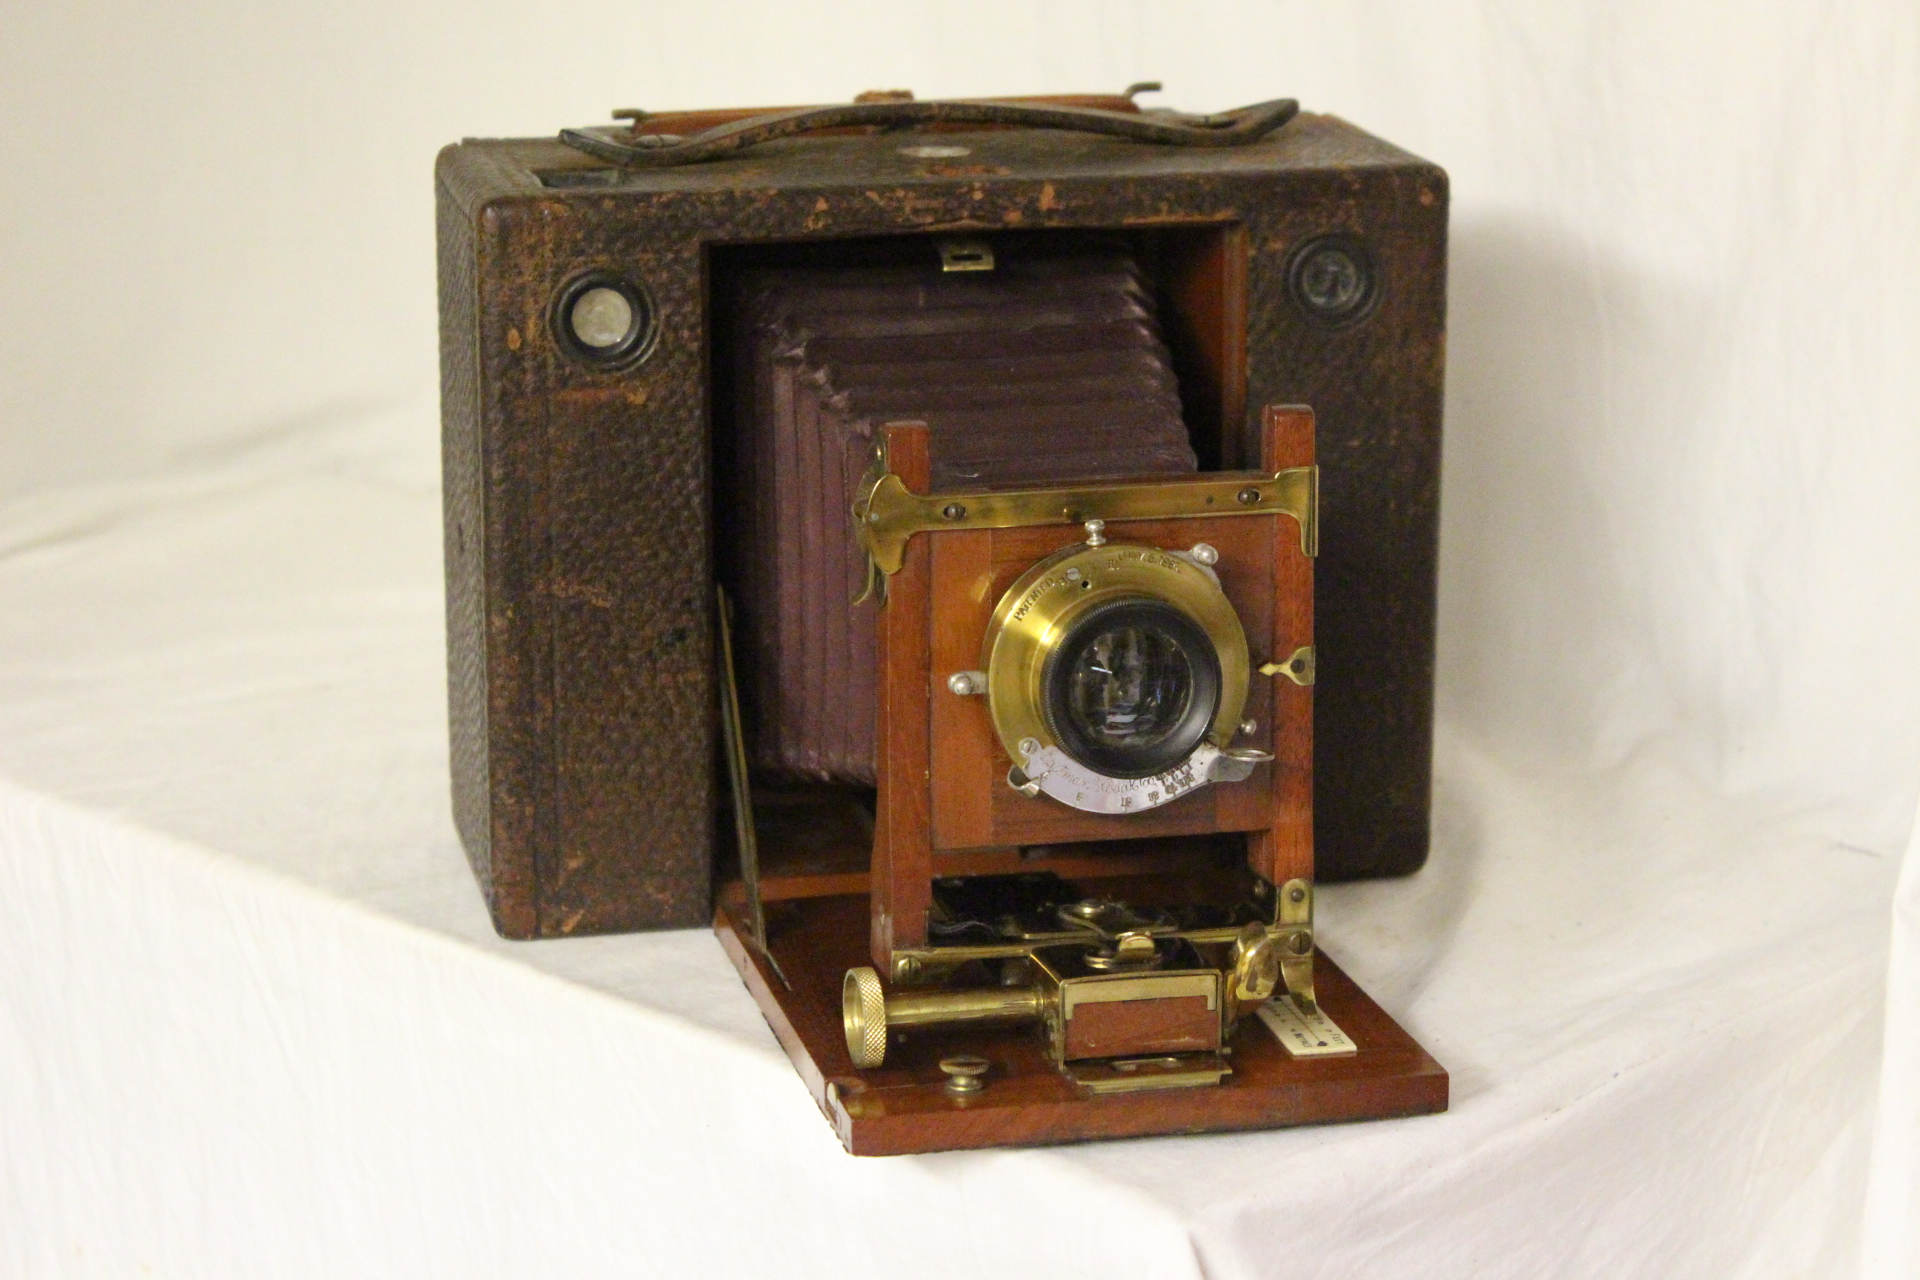 No. 2C Autographic Kodak Junior